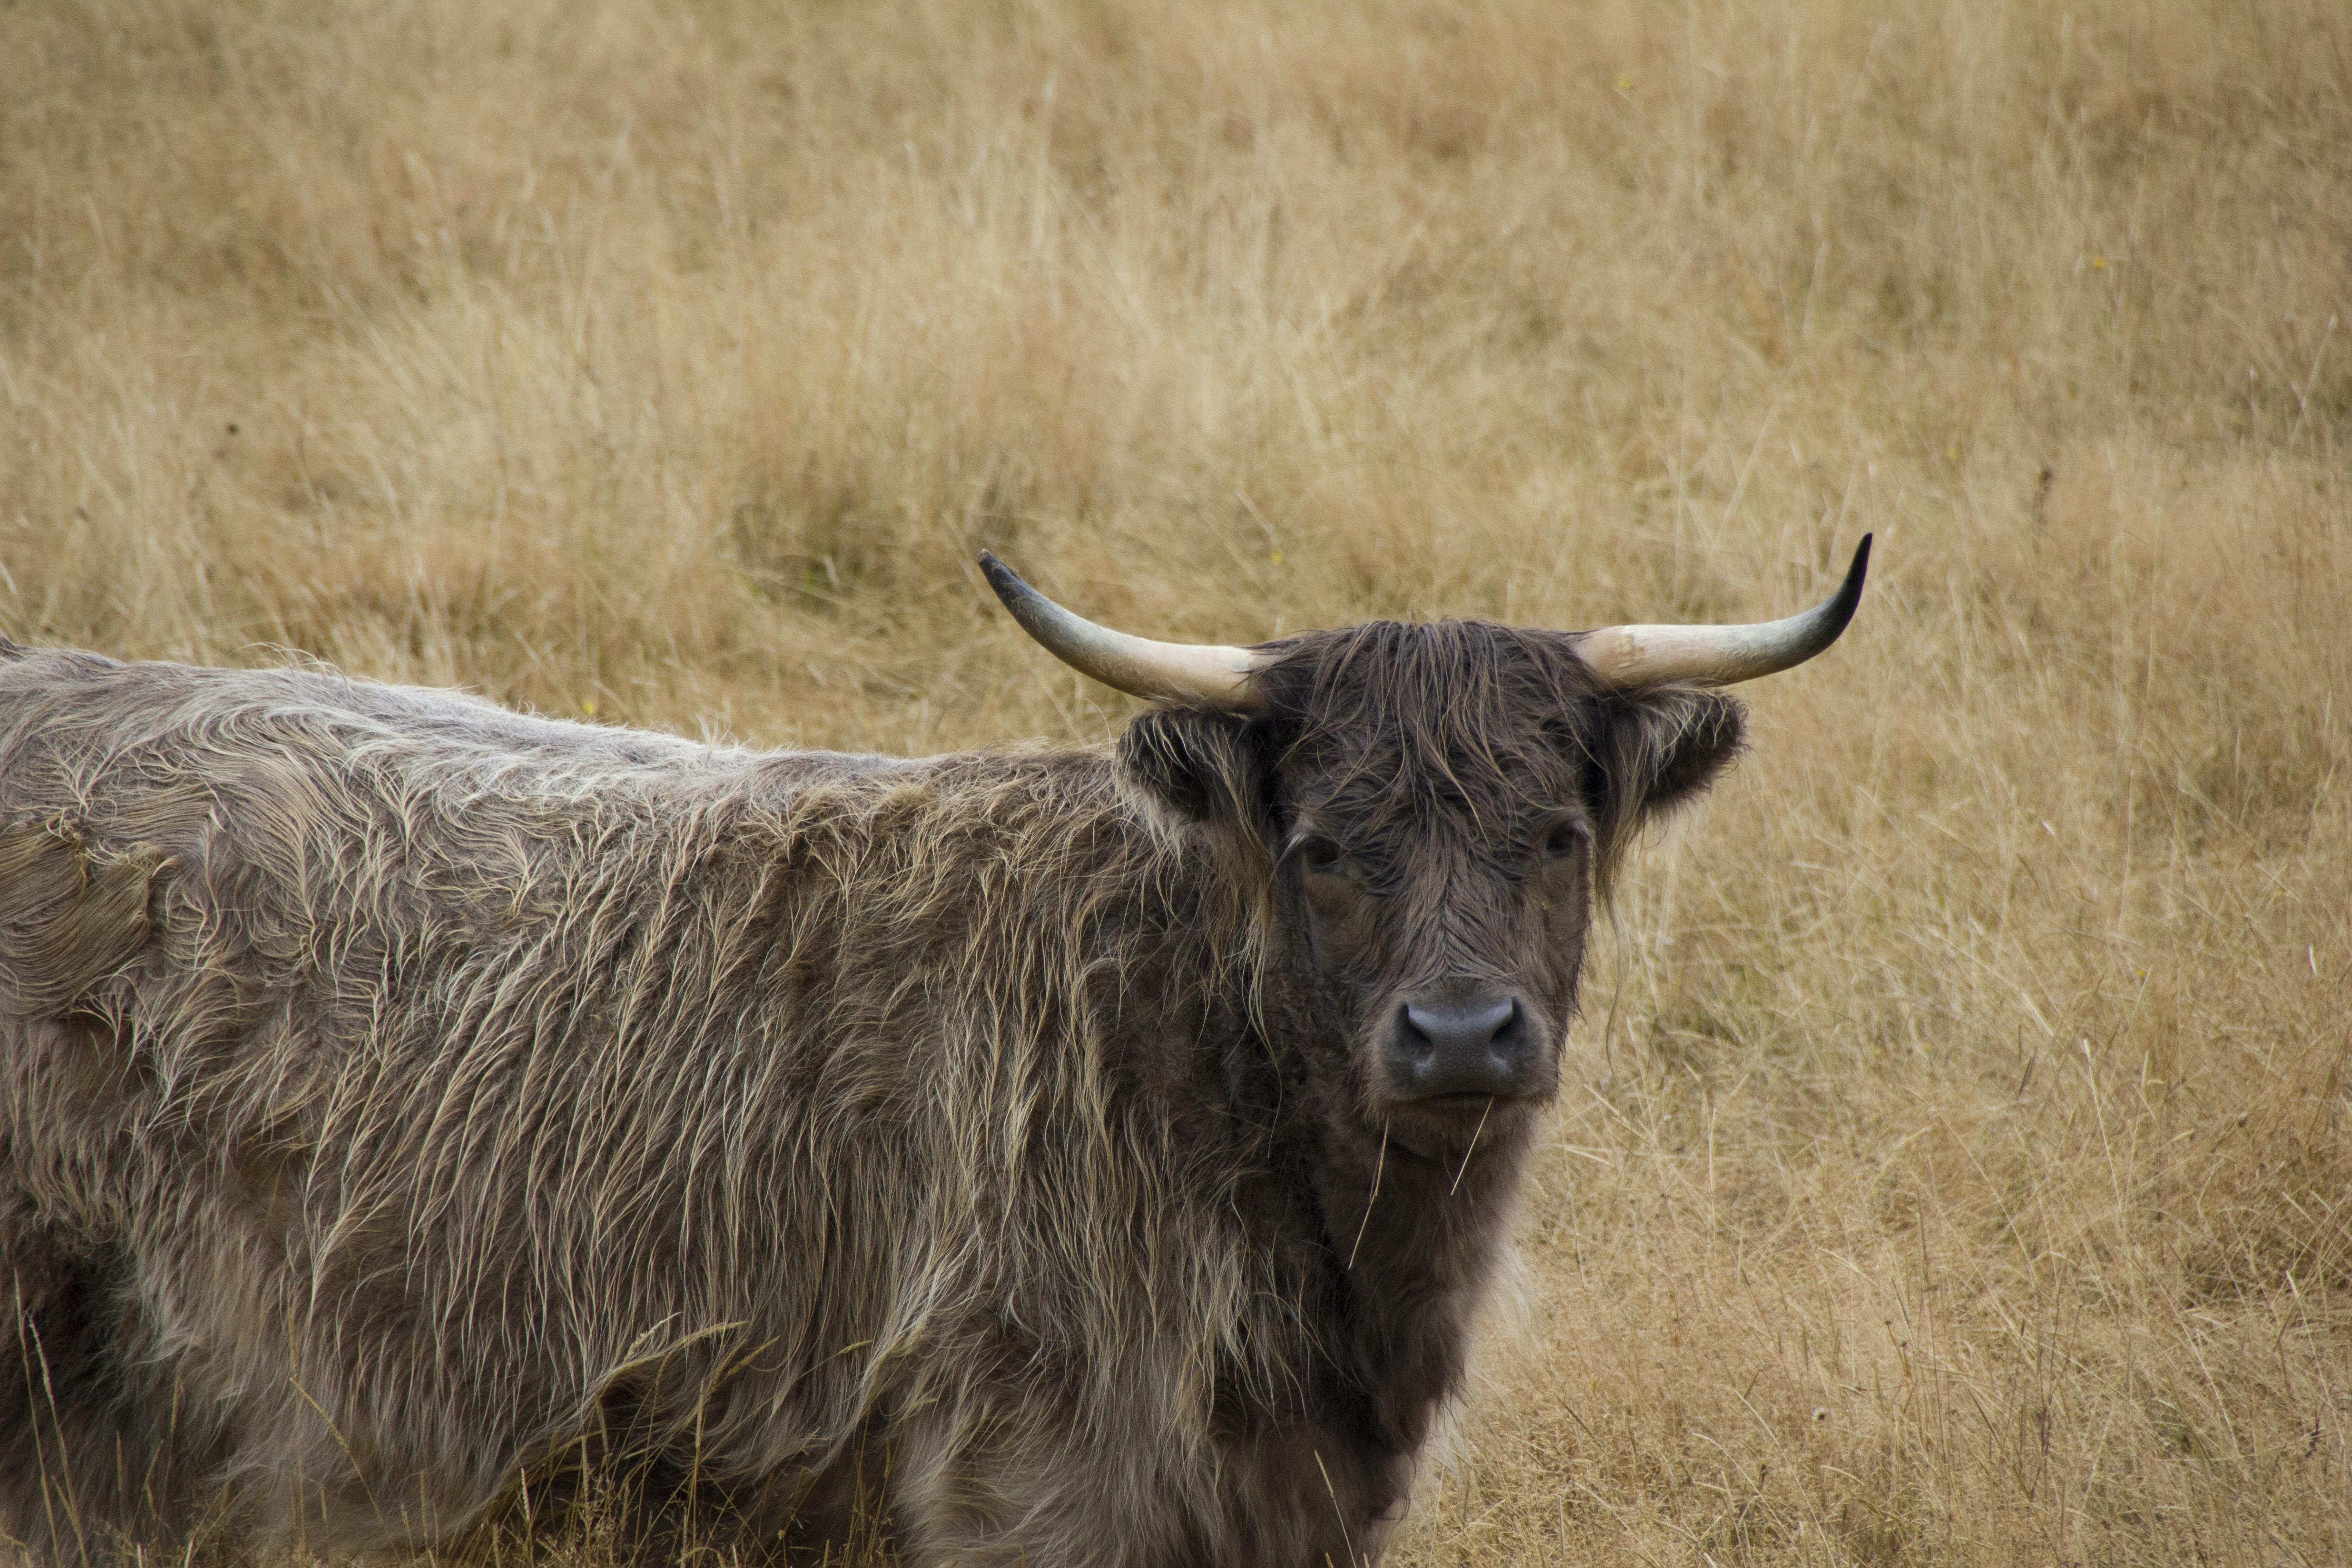 black yak on brown grass field